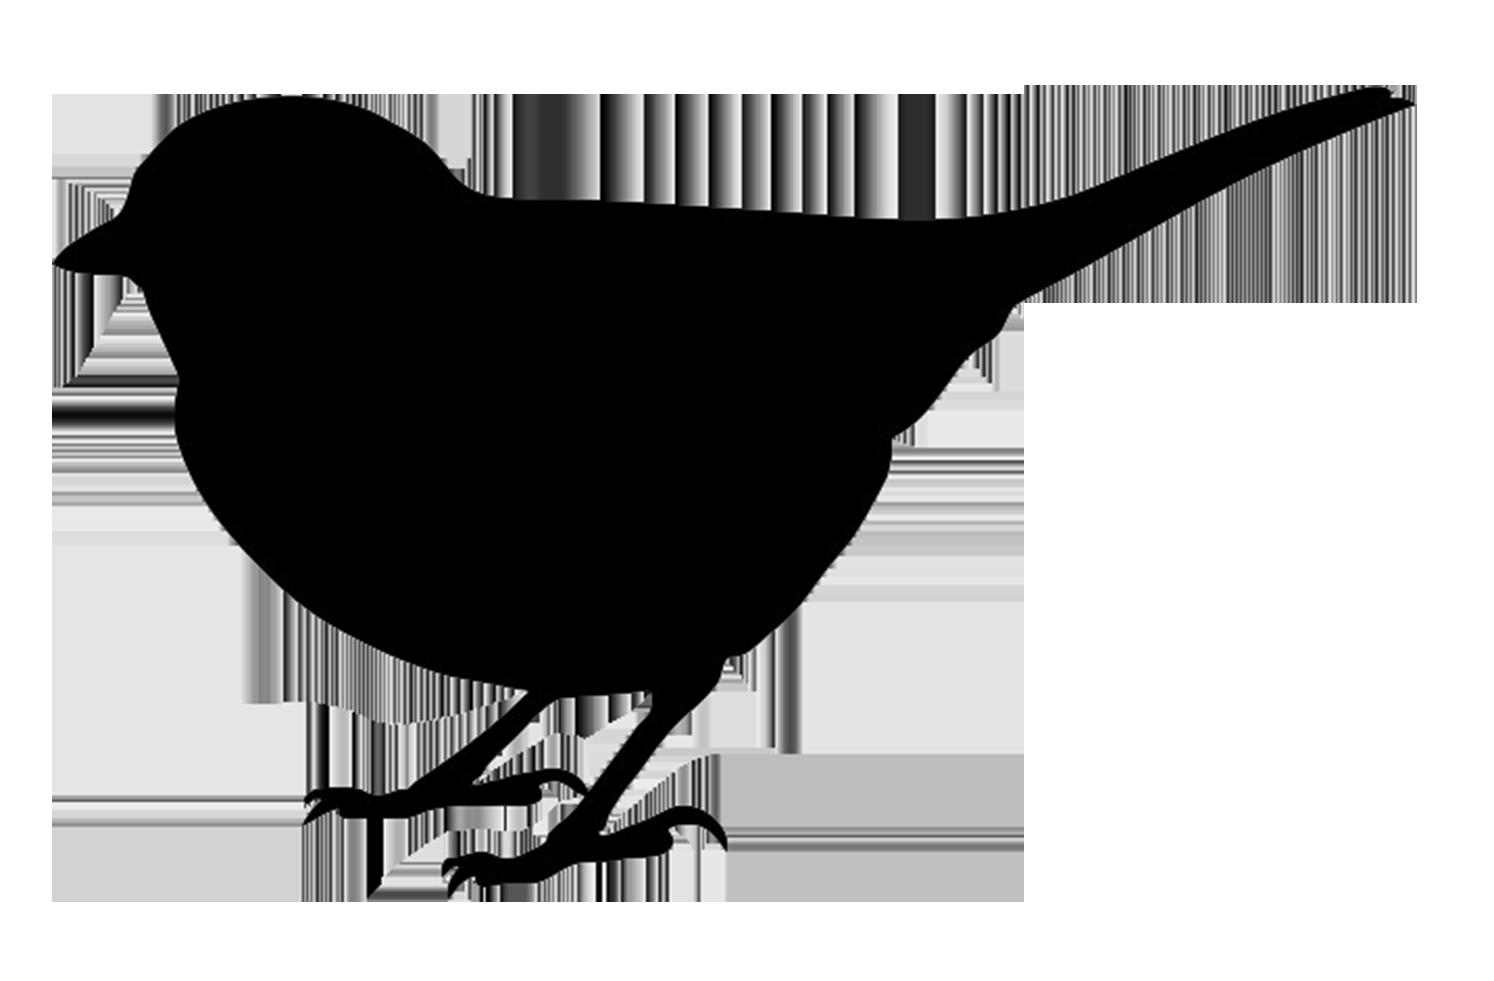 Bird silhouette clipart - Cli